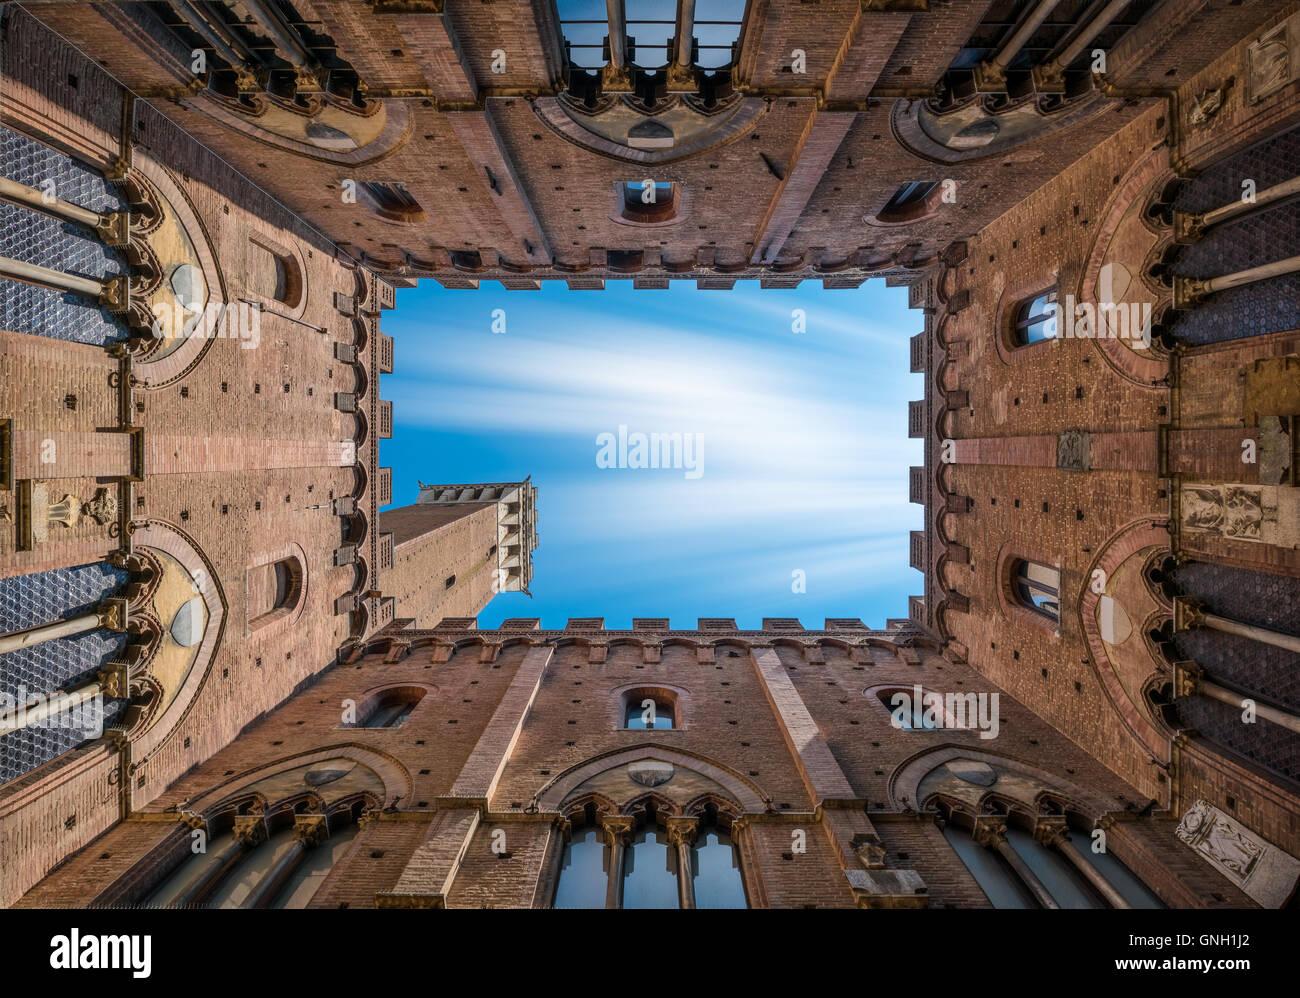 Torre del Mangia, Siena, Italy - Stock Image